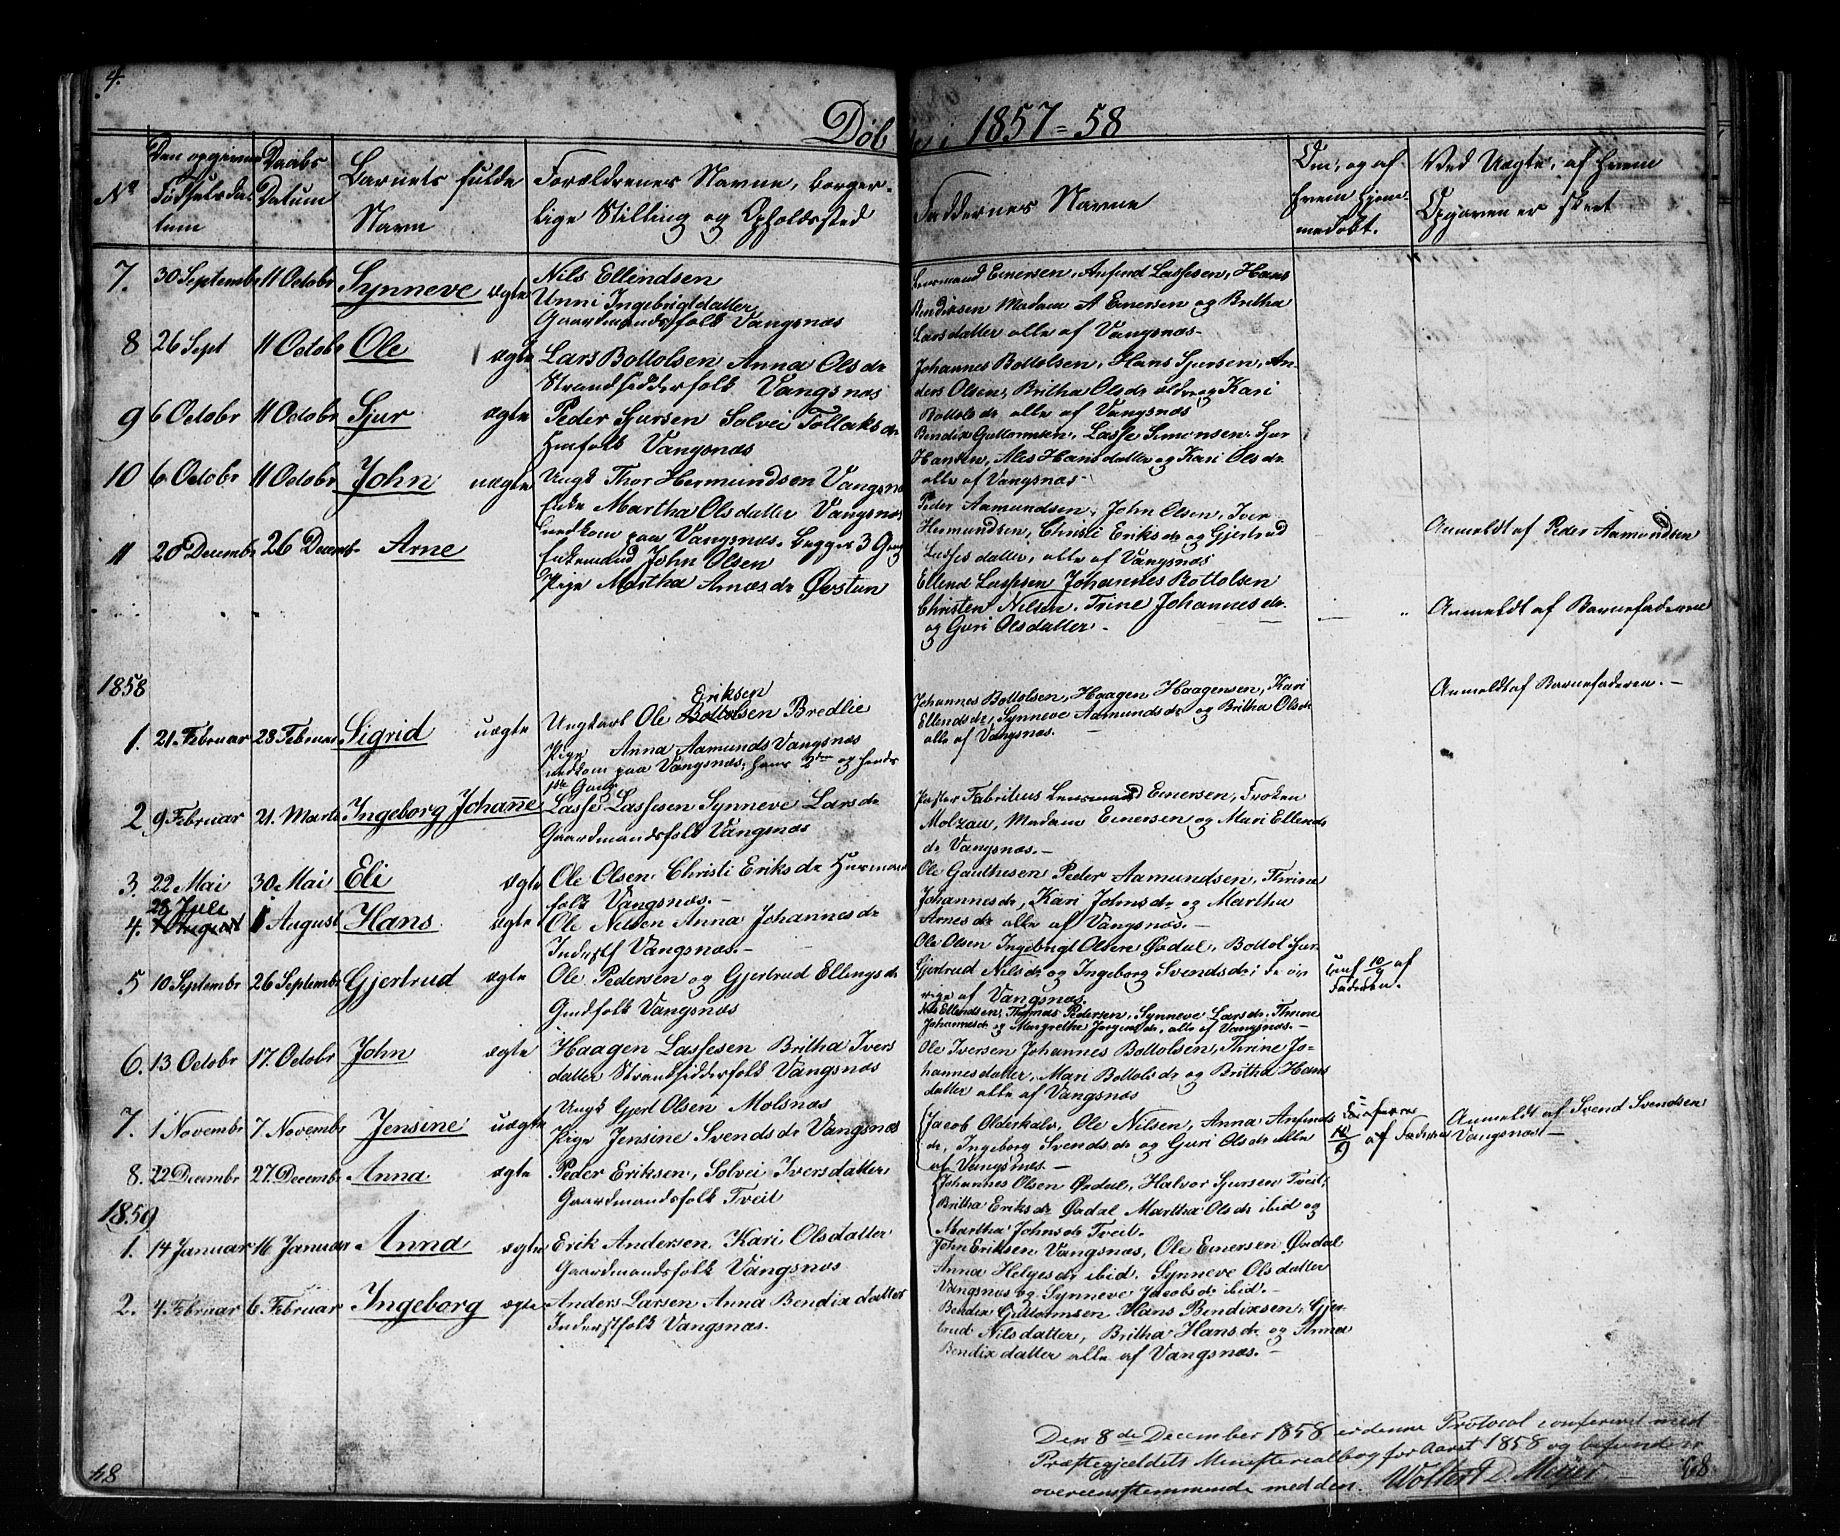 SAB, Vik sokneprestembete, Klokkerbok nr. C 1, 1853-1879, s. 4